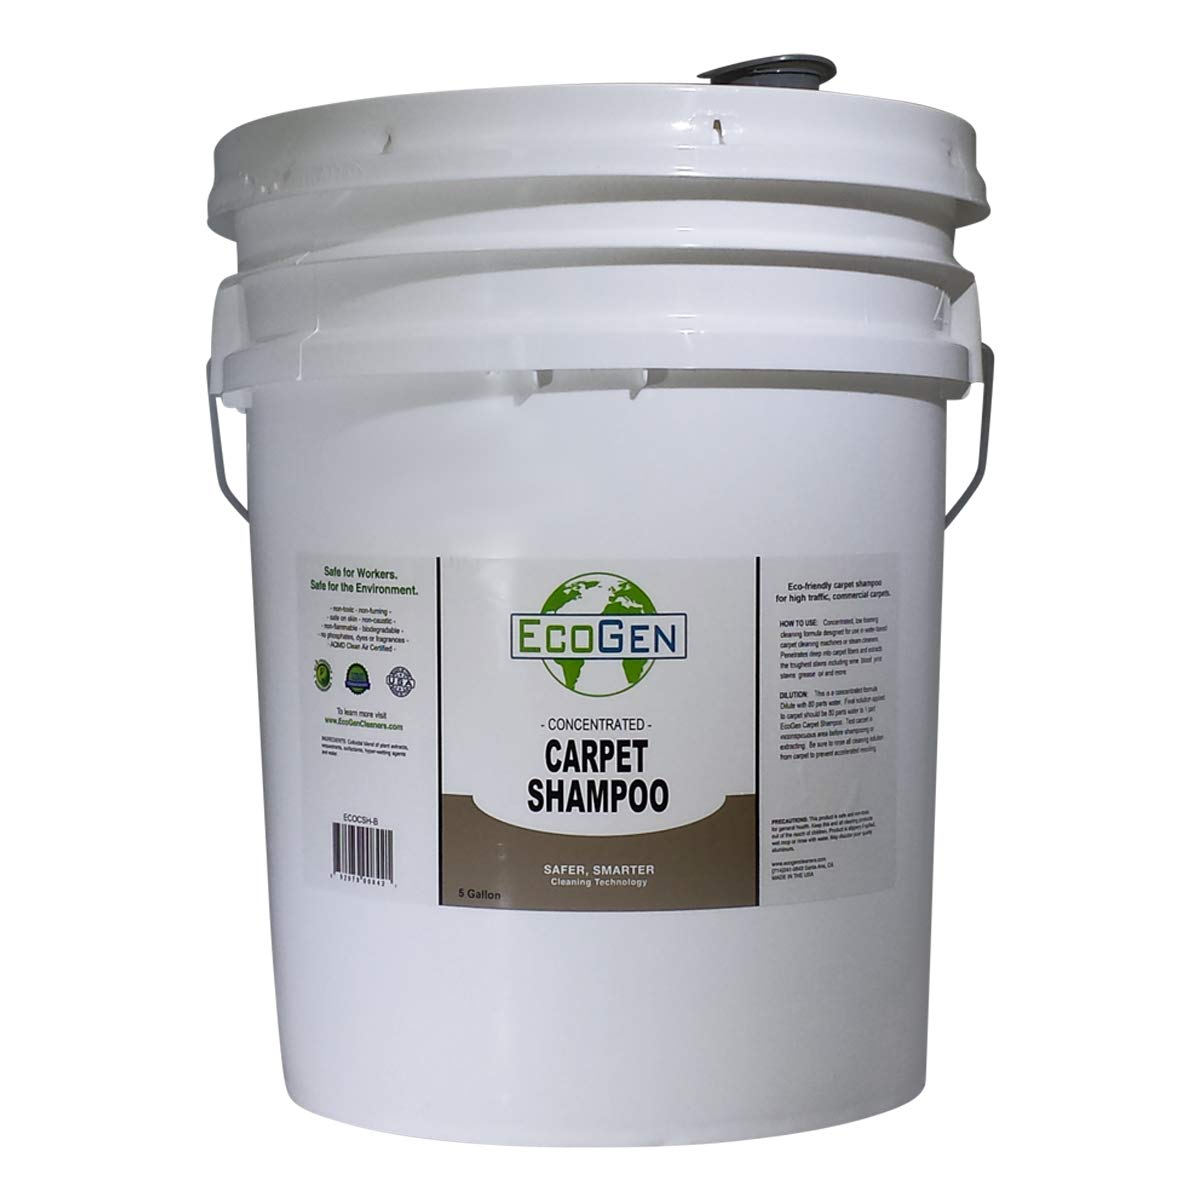 EcoGen ECOCSH-B Professional Strength Carpet Shampoo, Concentrated, 5 Gallon Bucket by EcoGen